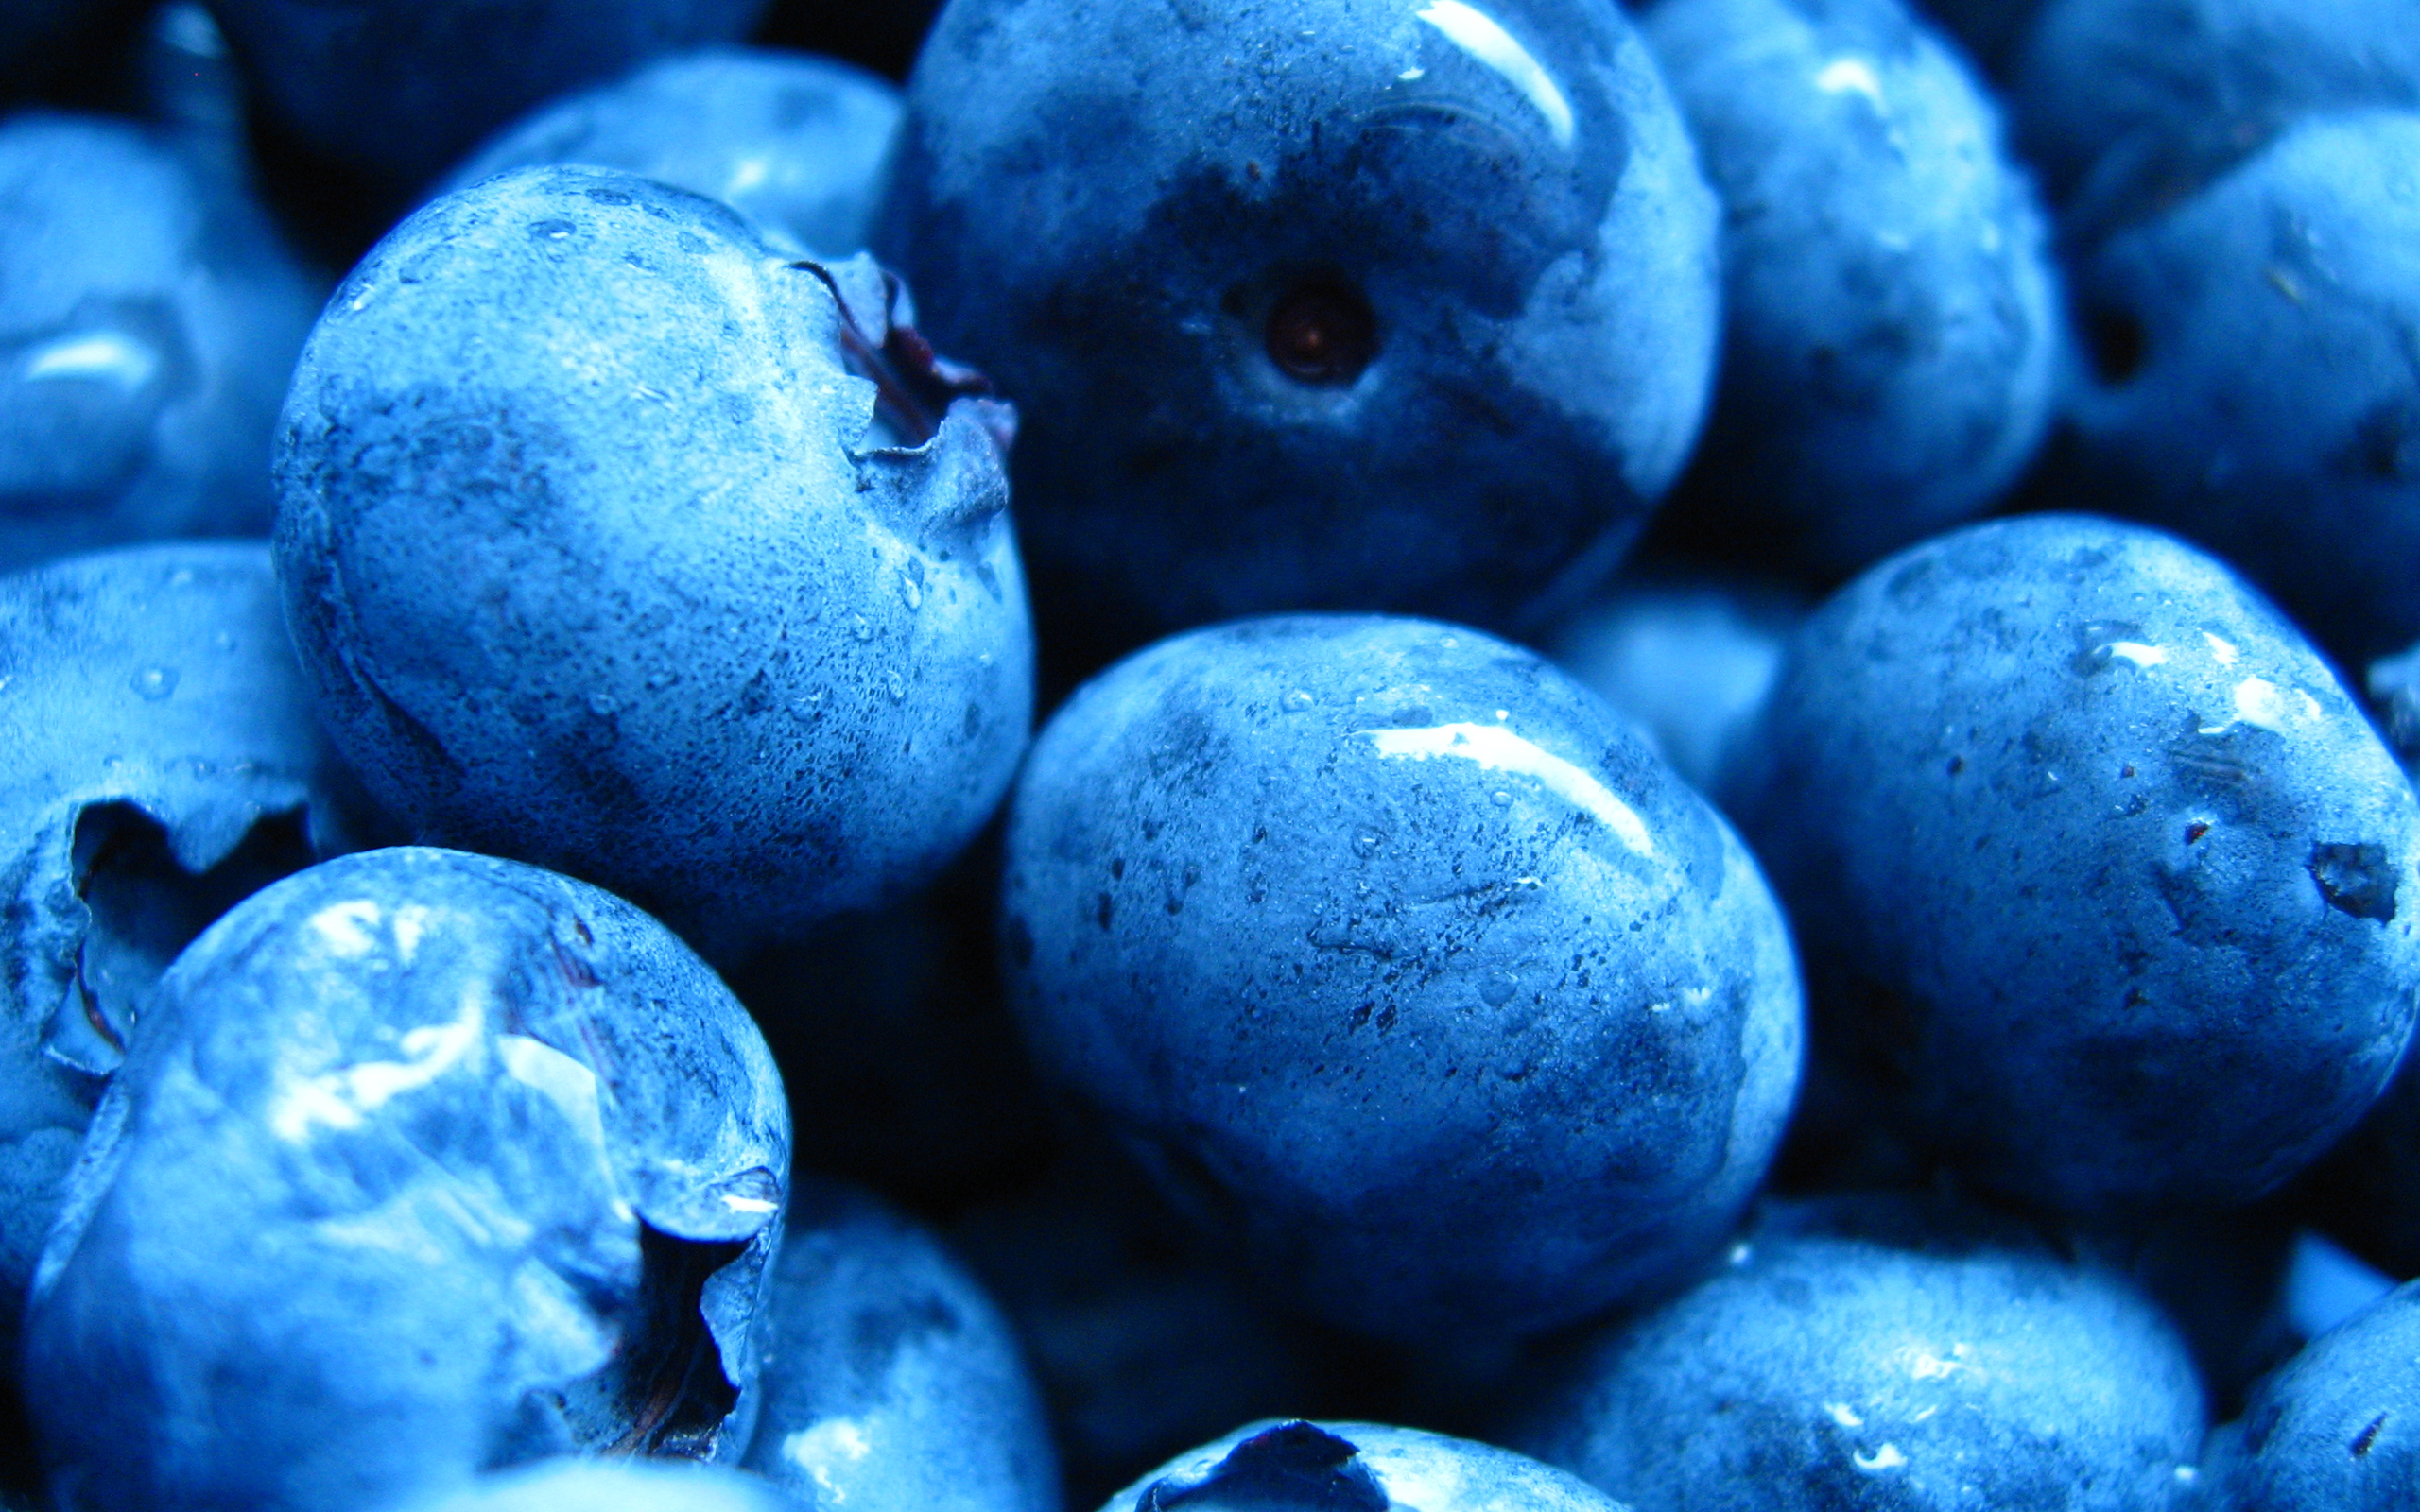 blueberries 20404